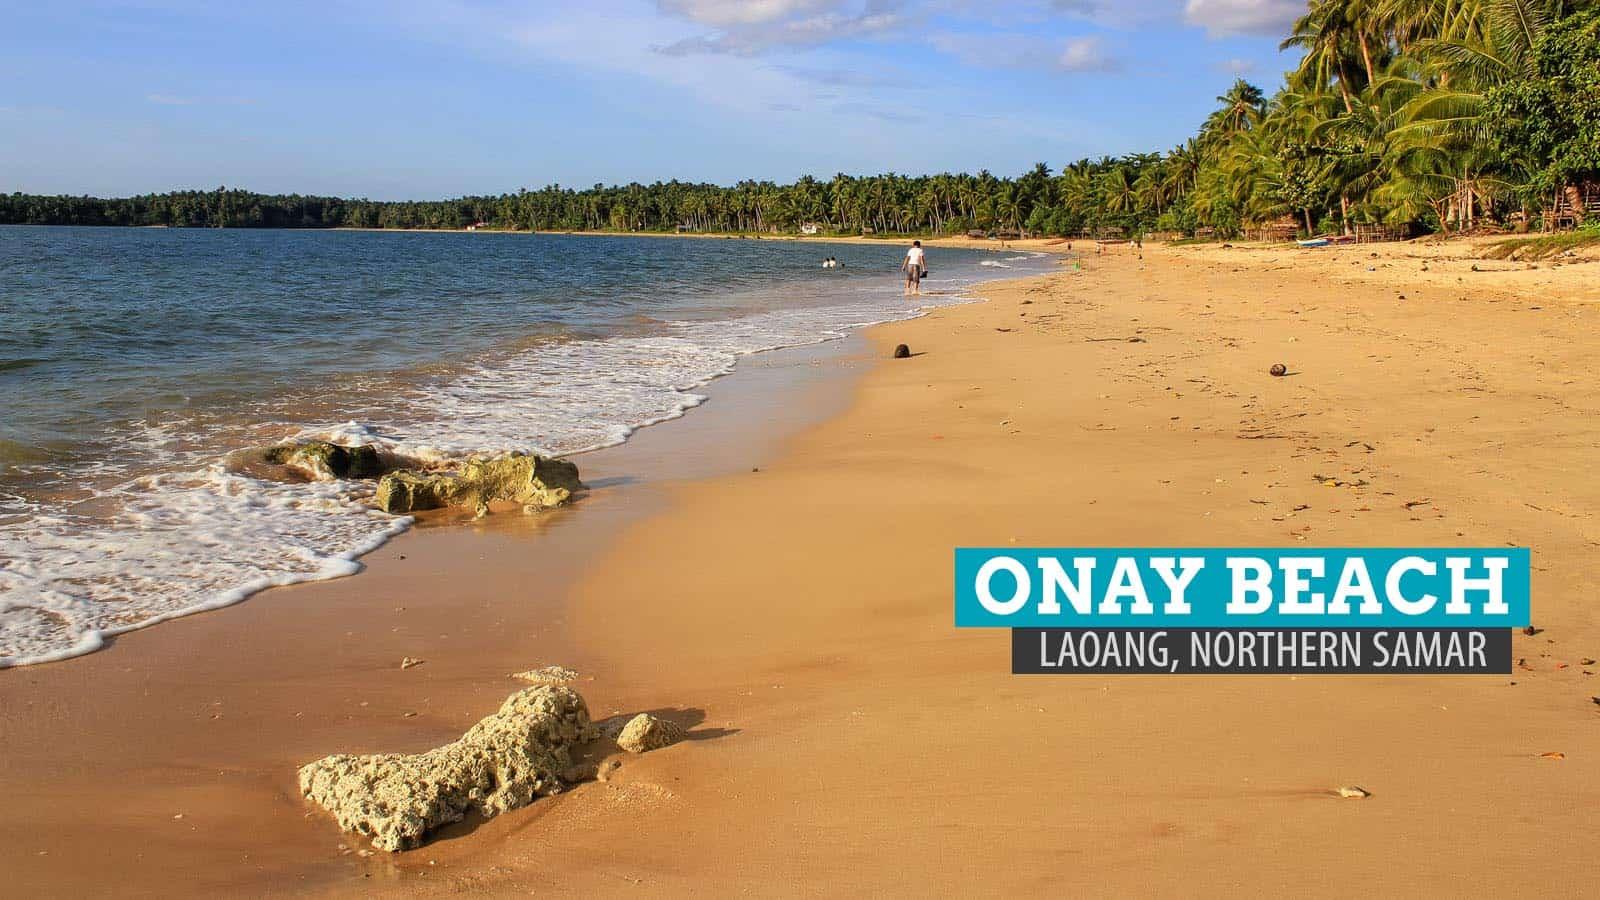 Onay Beach in Laoang Island, Northern Samar, Philippines